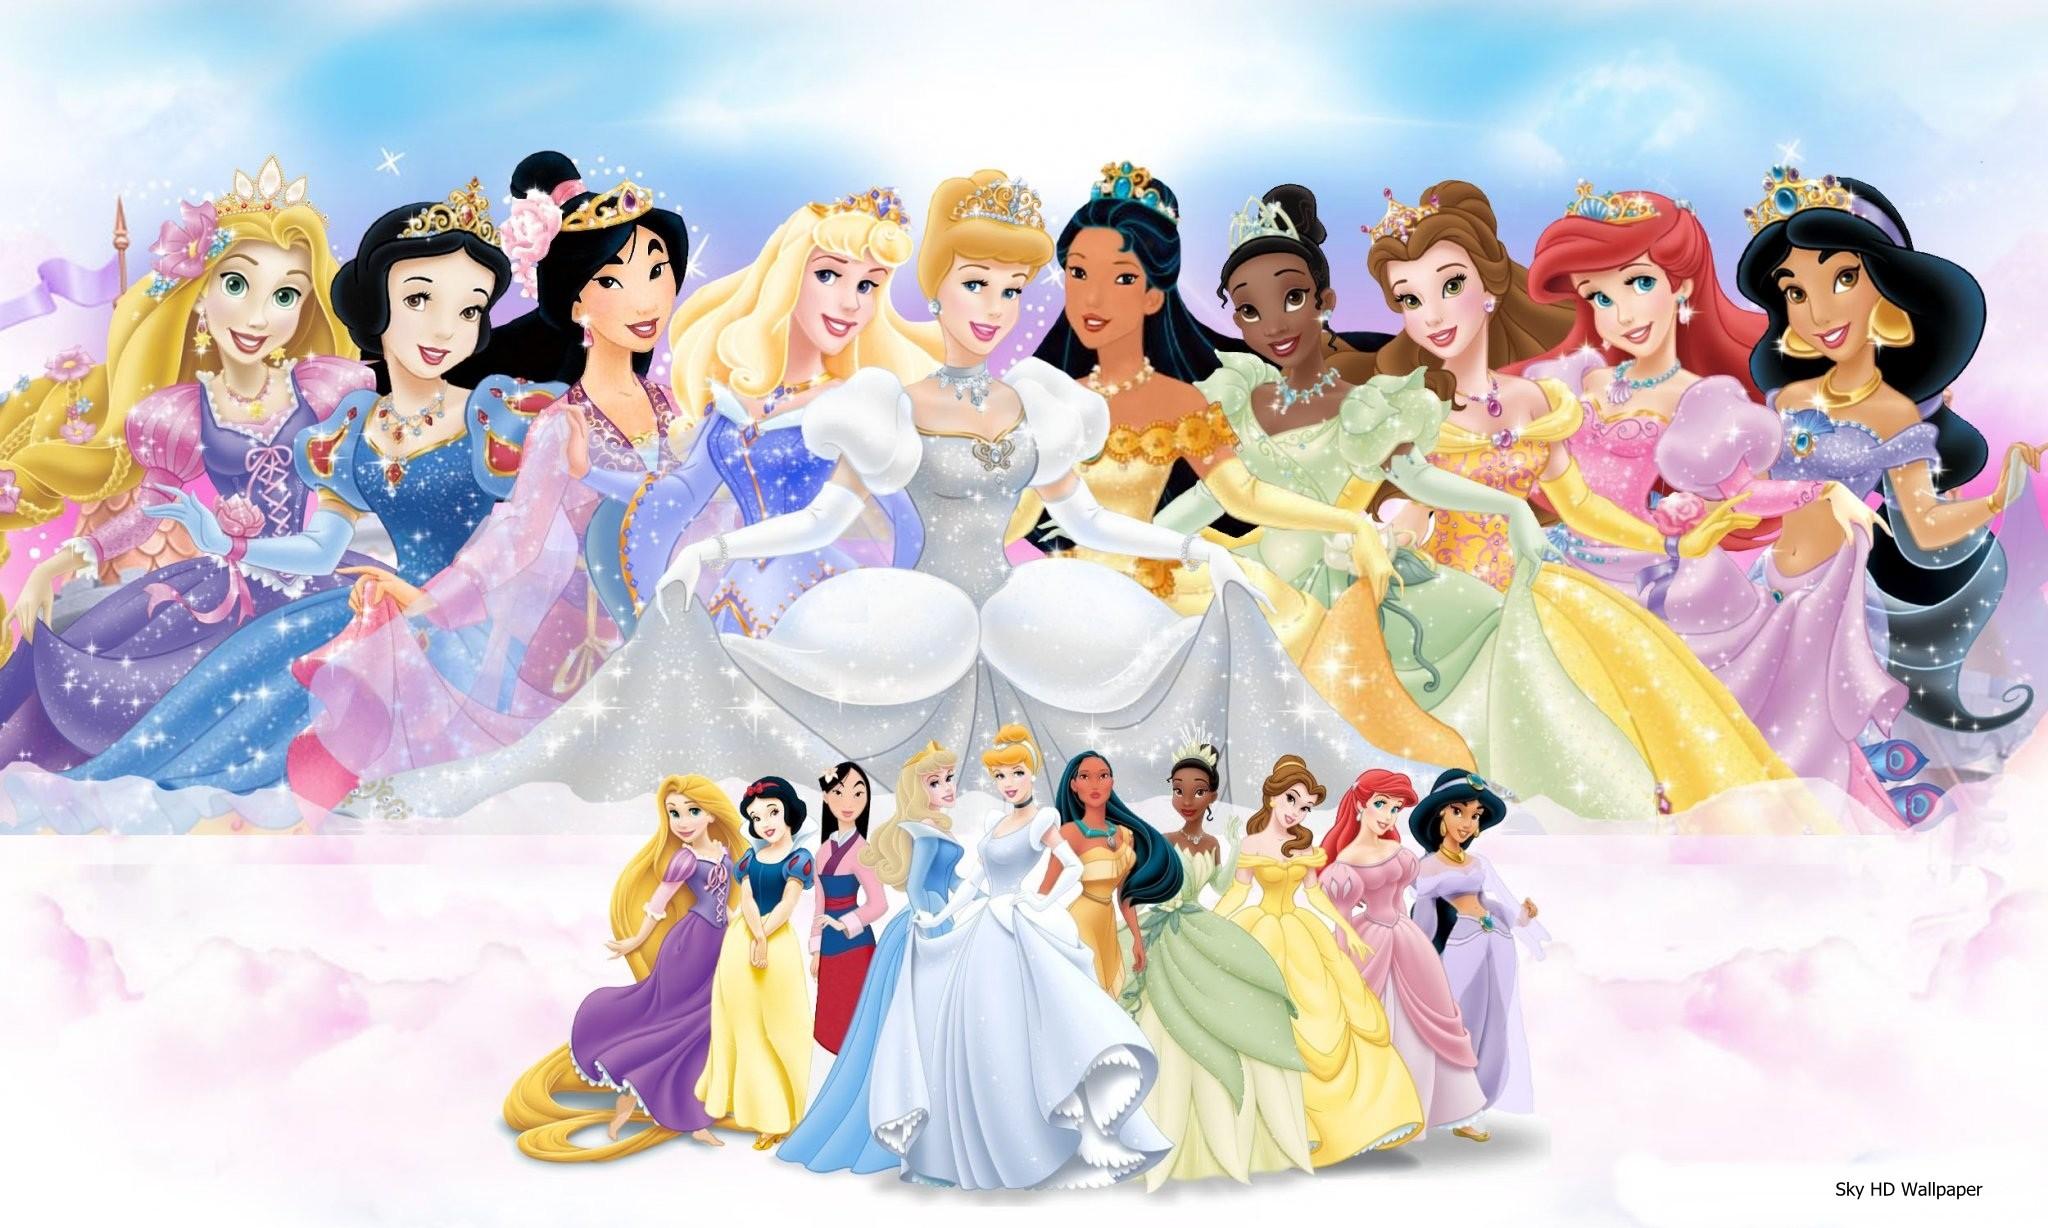 Disney Princess Christmas Wallpapers Wallpaper 1280×1024 Princess Images  Wallpapers (54 Wallpapers) |